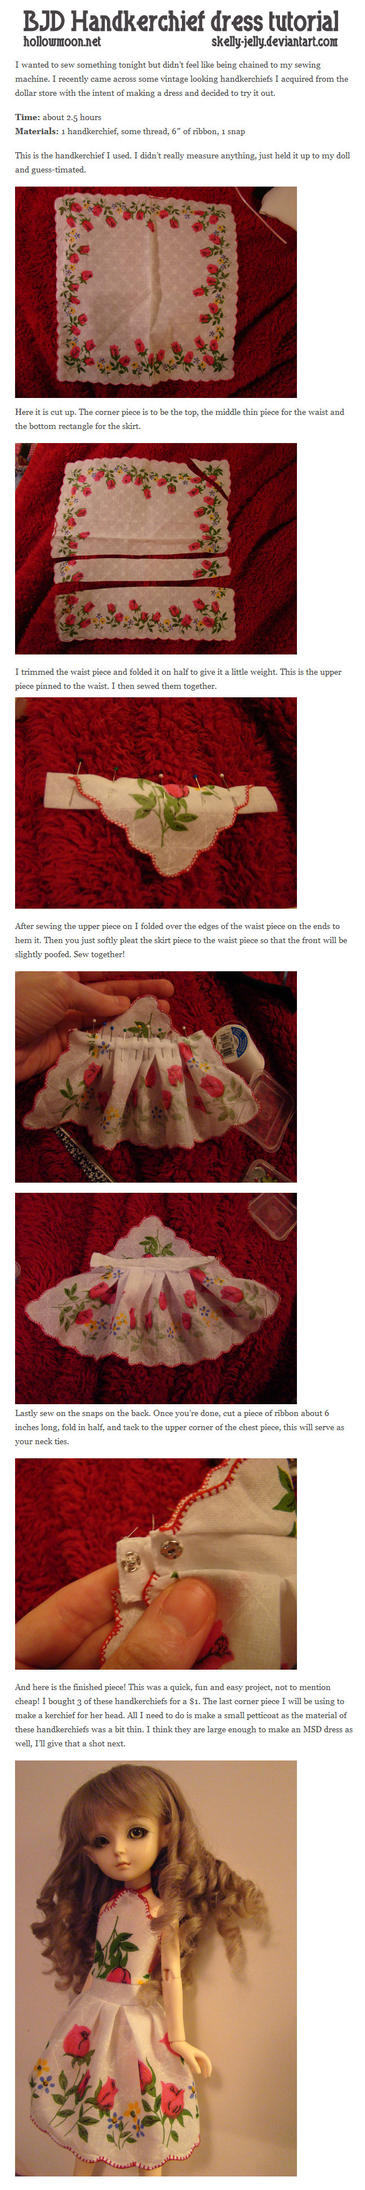 BJD Handkerchief dress tutorial by skelly-jelly